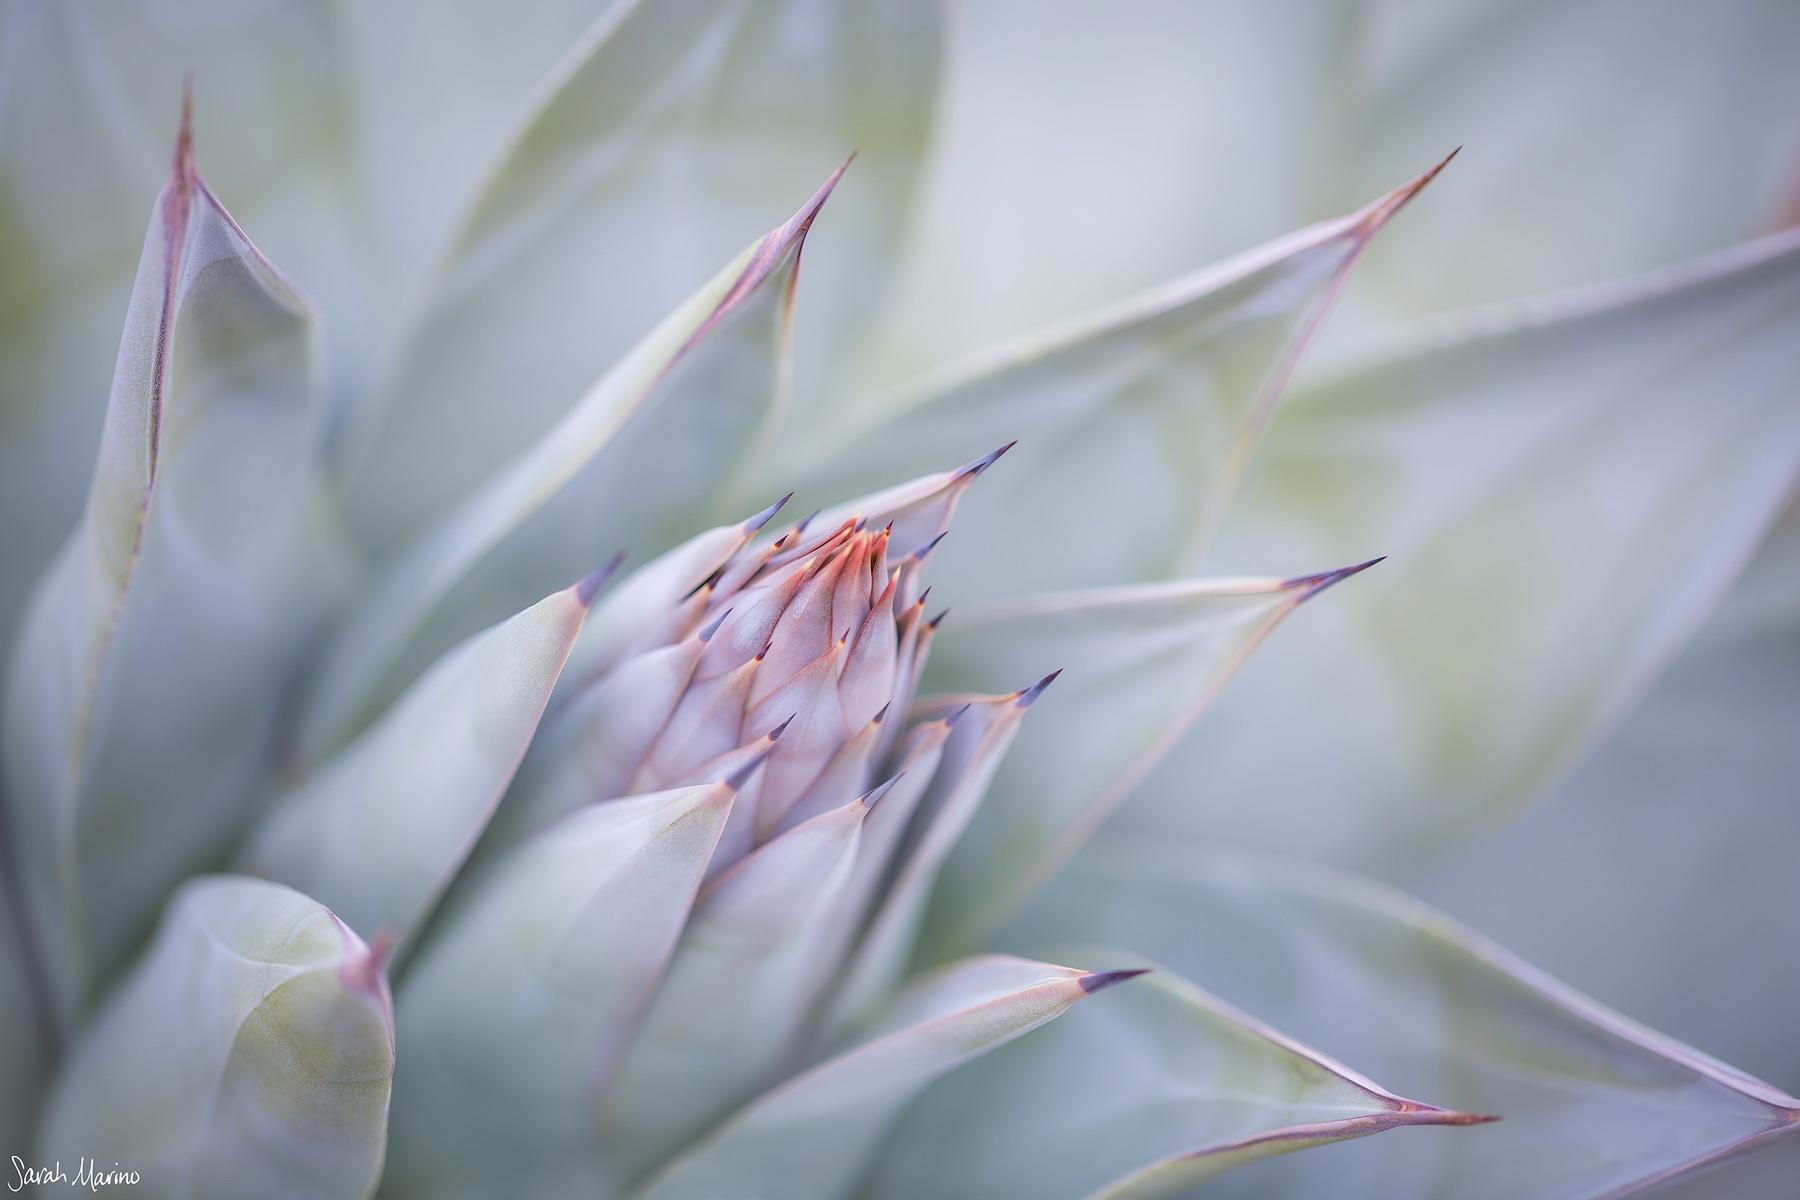 Sarah-Marino-California-Mojave-Agave-1200px-Watermark.jpg